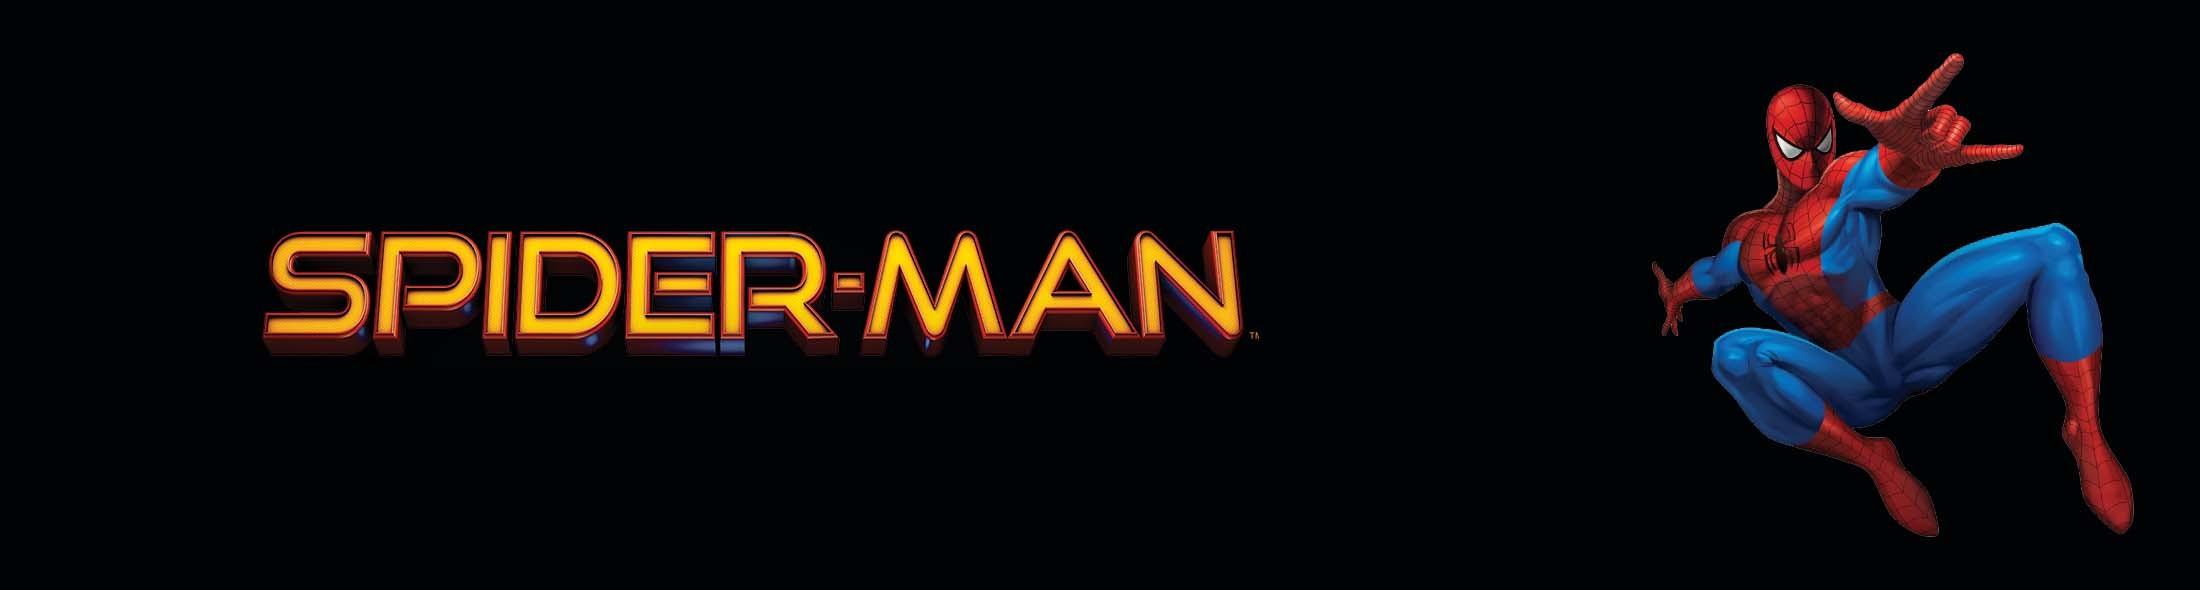 koning & Eindbaas Spiderman